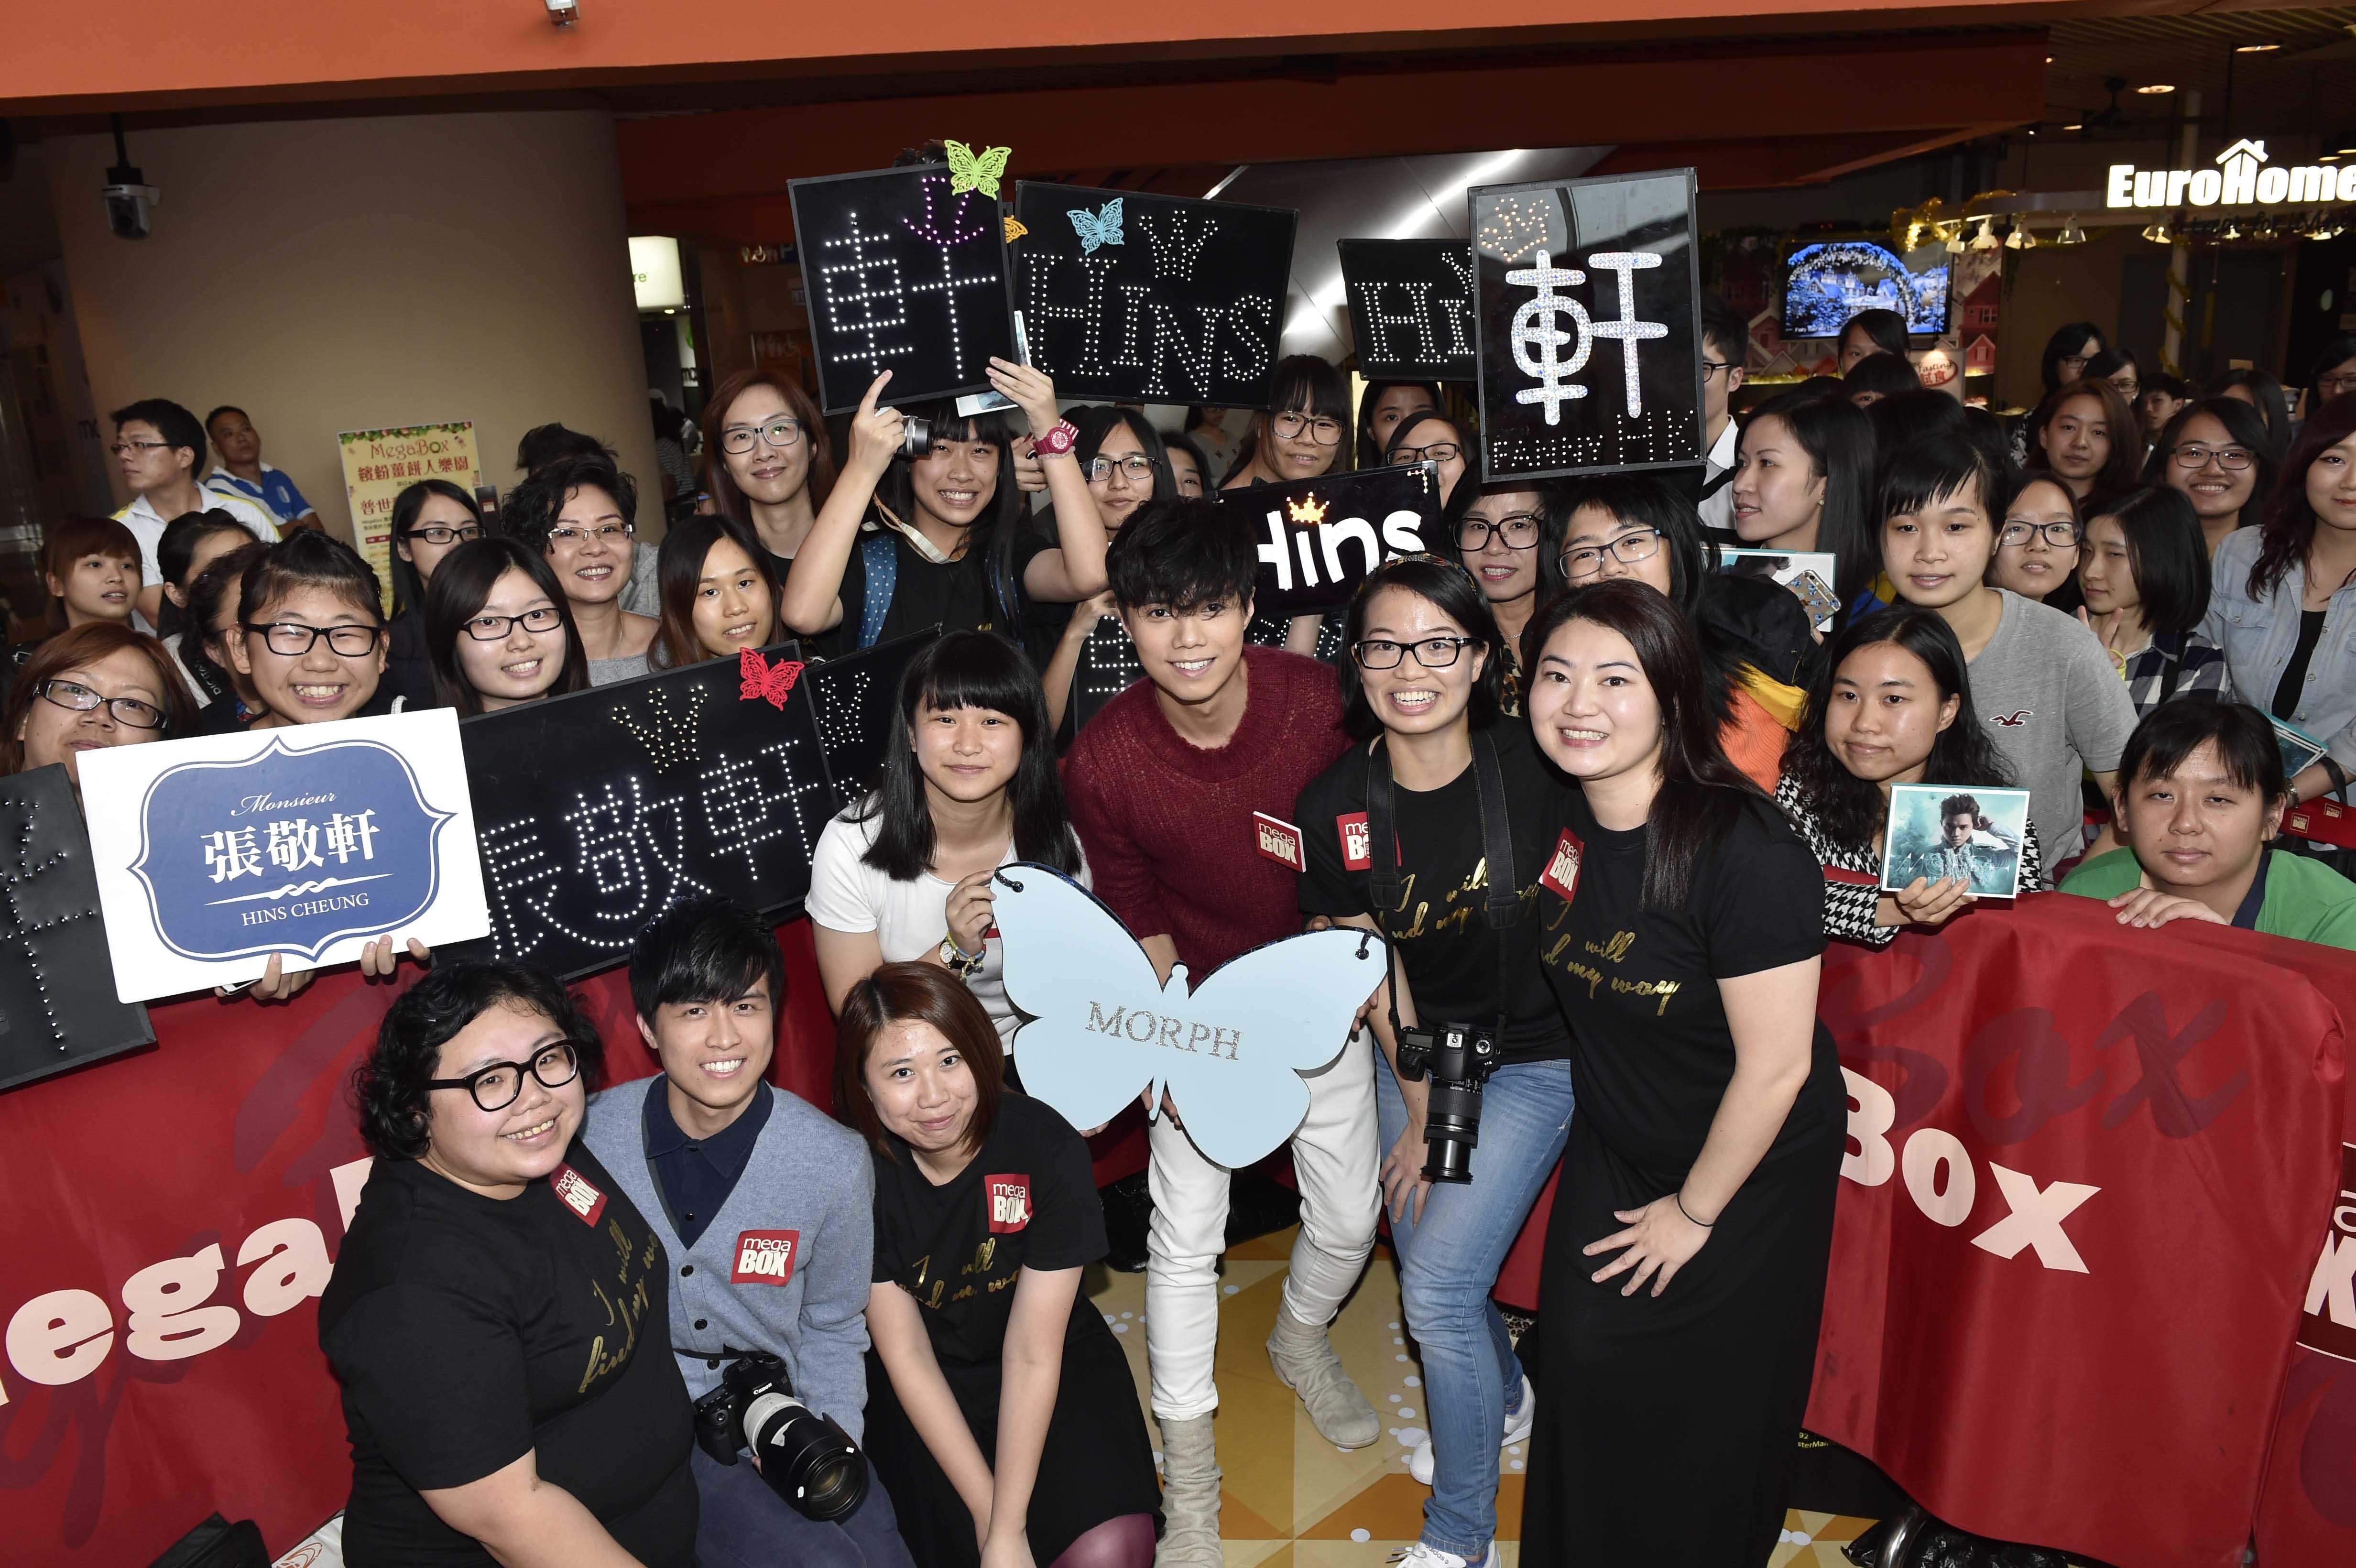 MegaBox x Hins Cheung《Morph》X'mas Autograph Signing